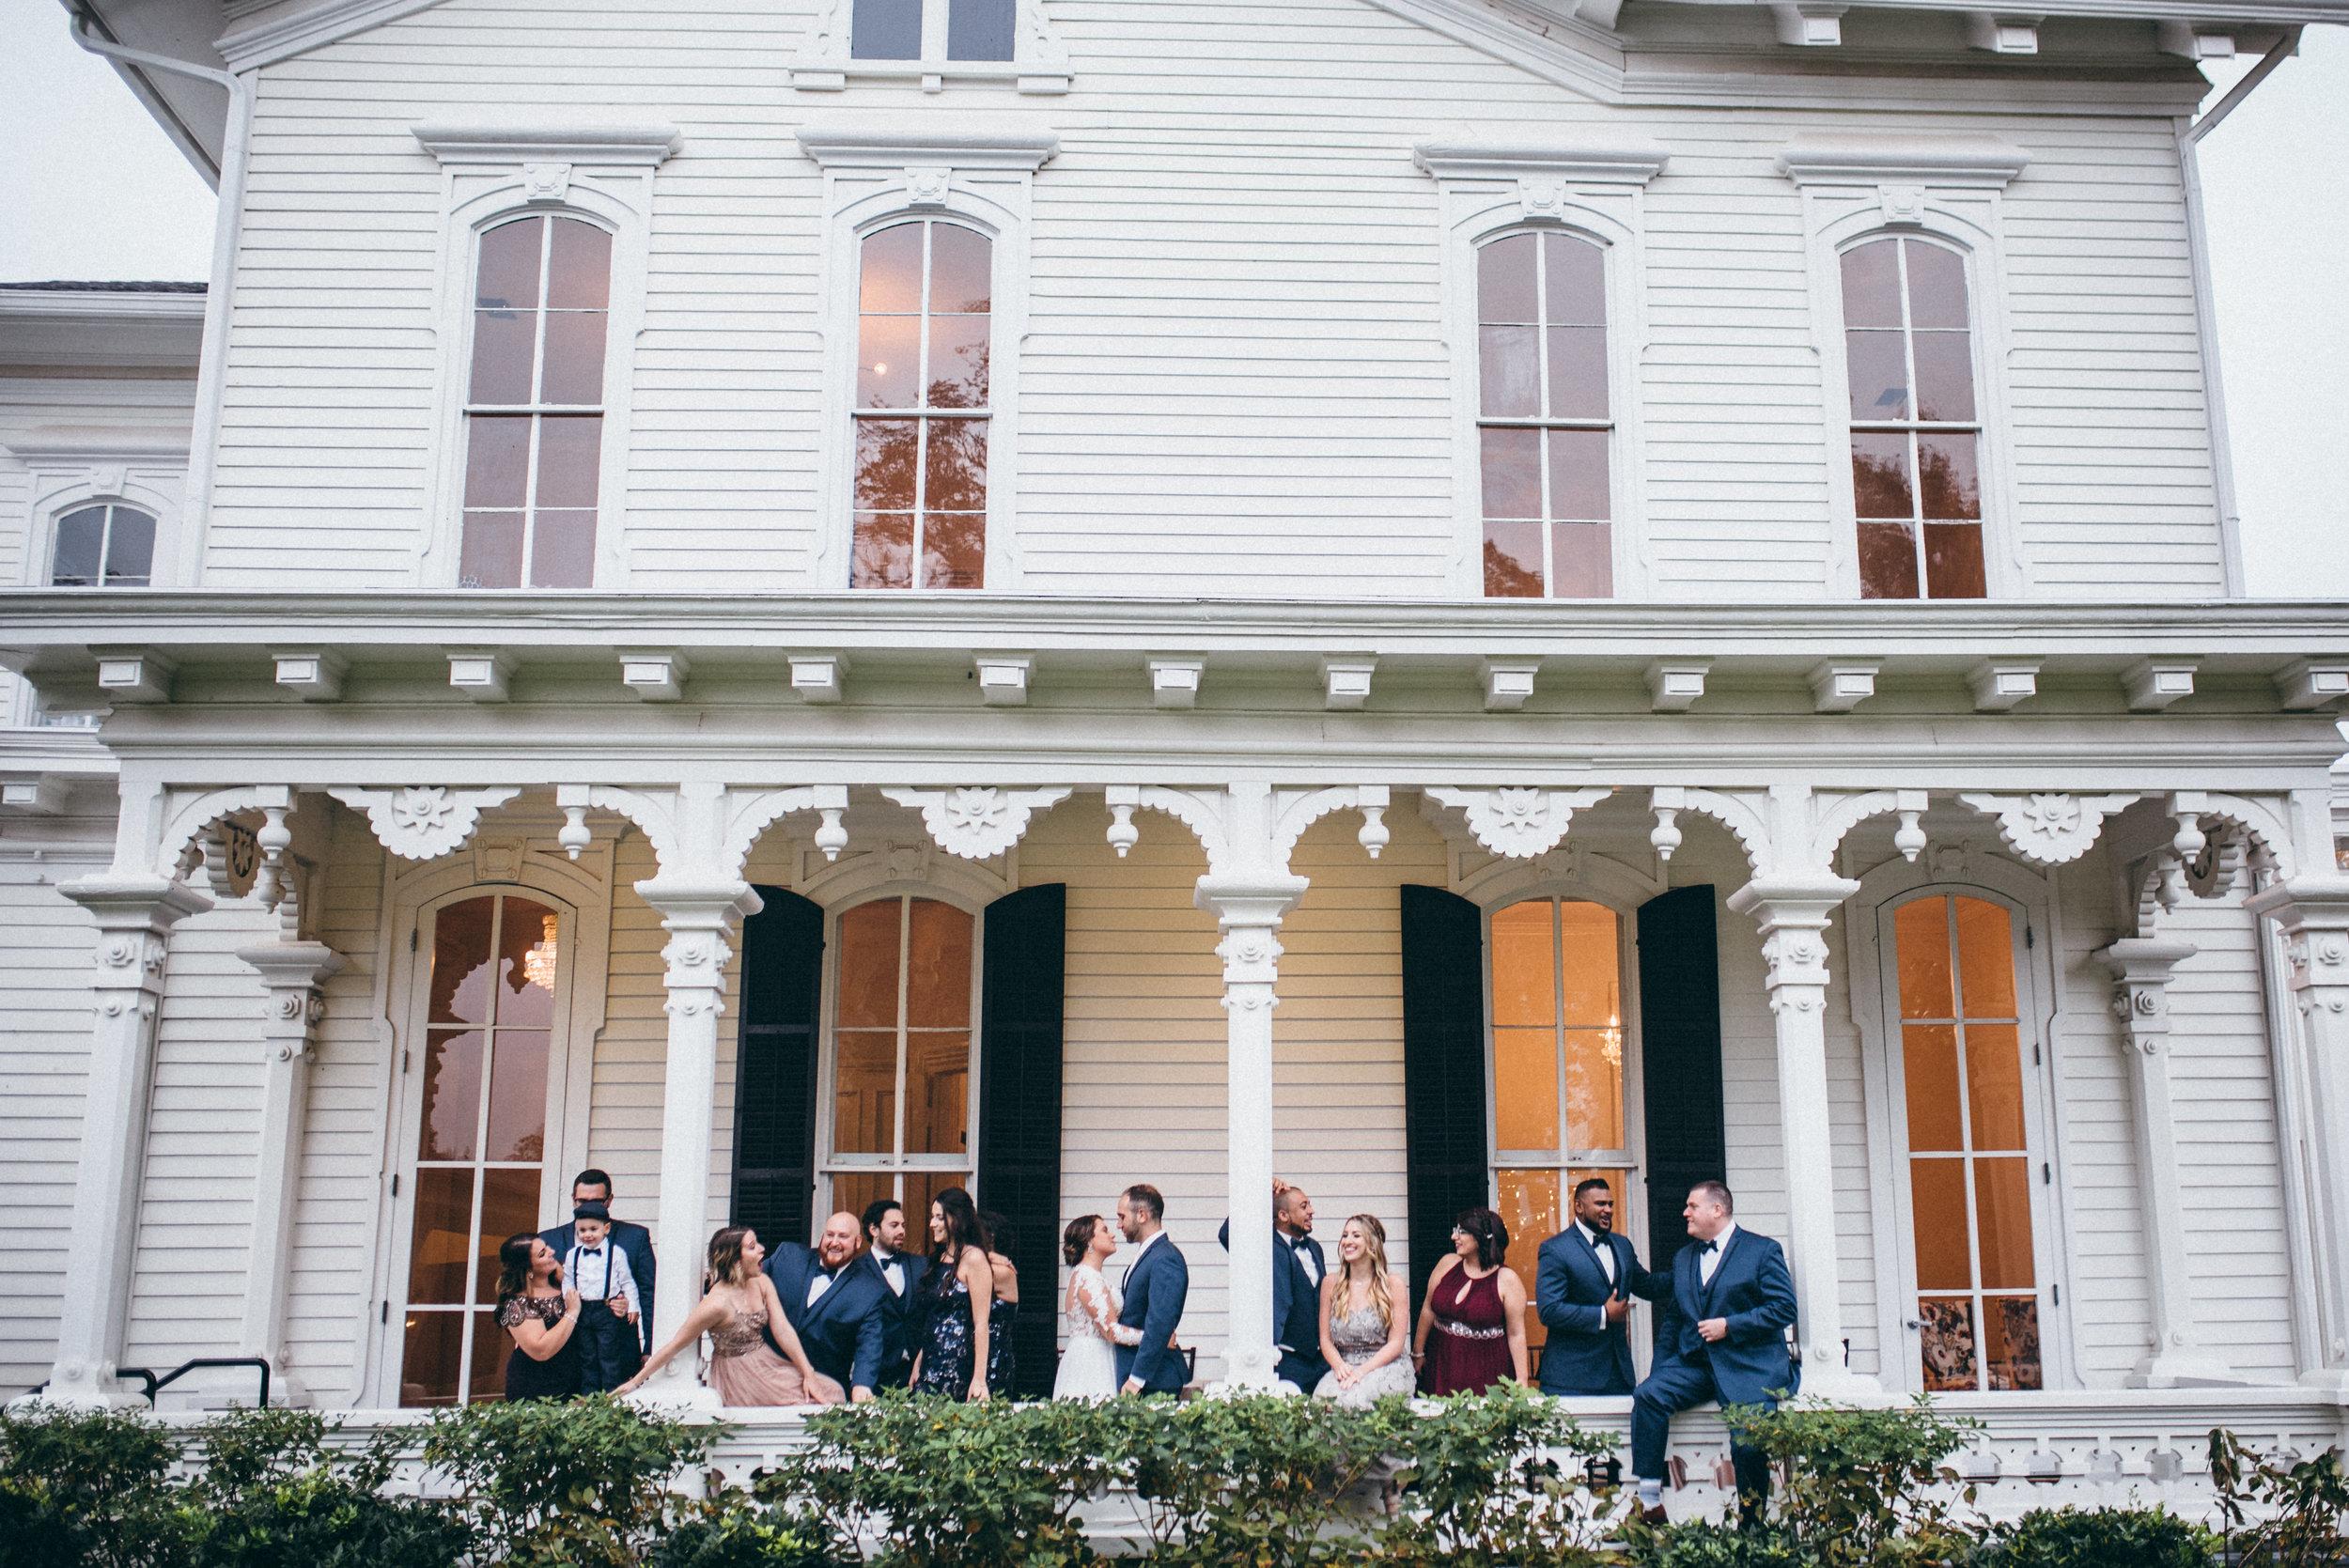 Merrimon Wynn House - raleigh wedding photography - north carolina wedding photographerMerrimon Wynn House - raleigh wedding photography - north carolina wedding photographer